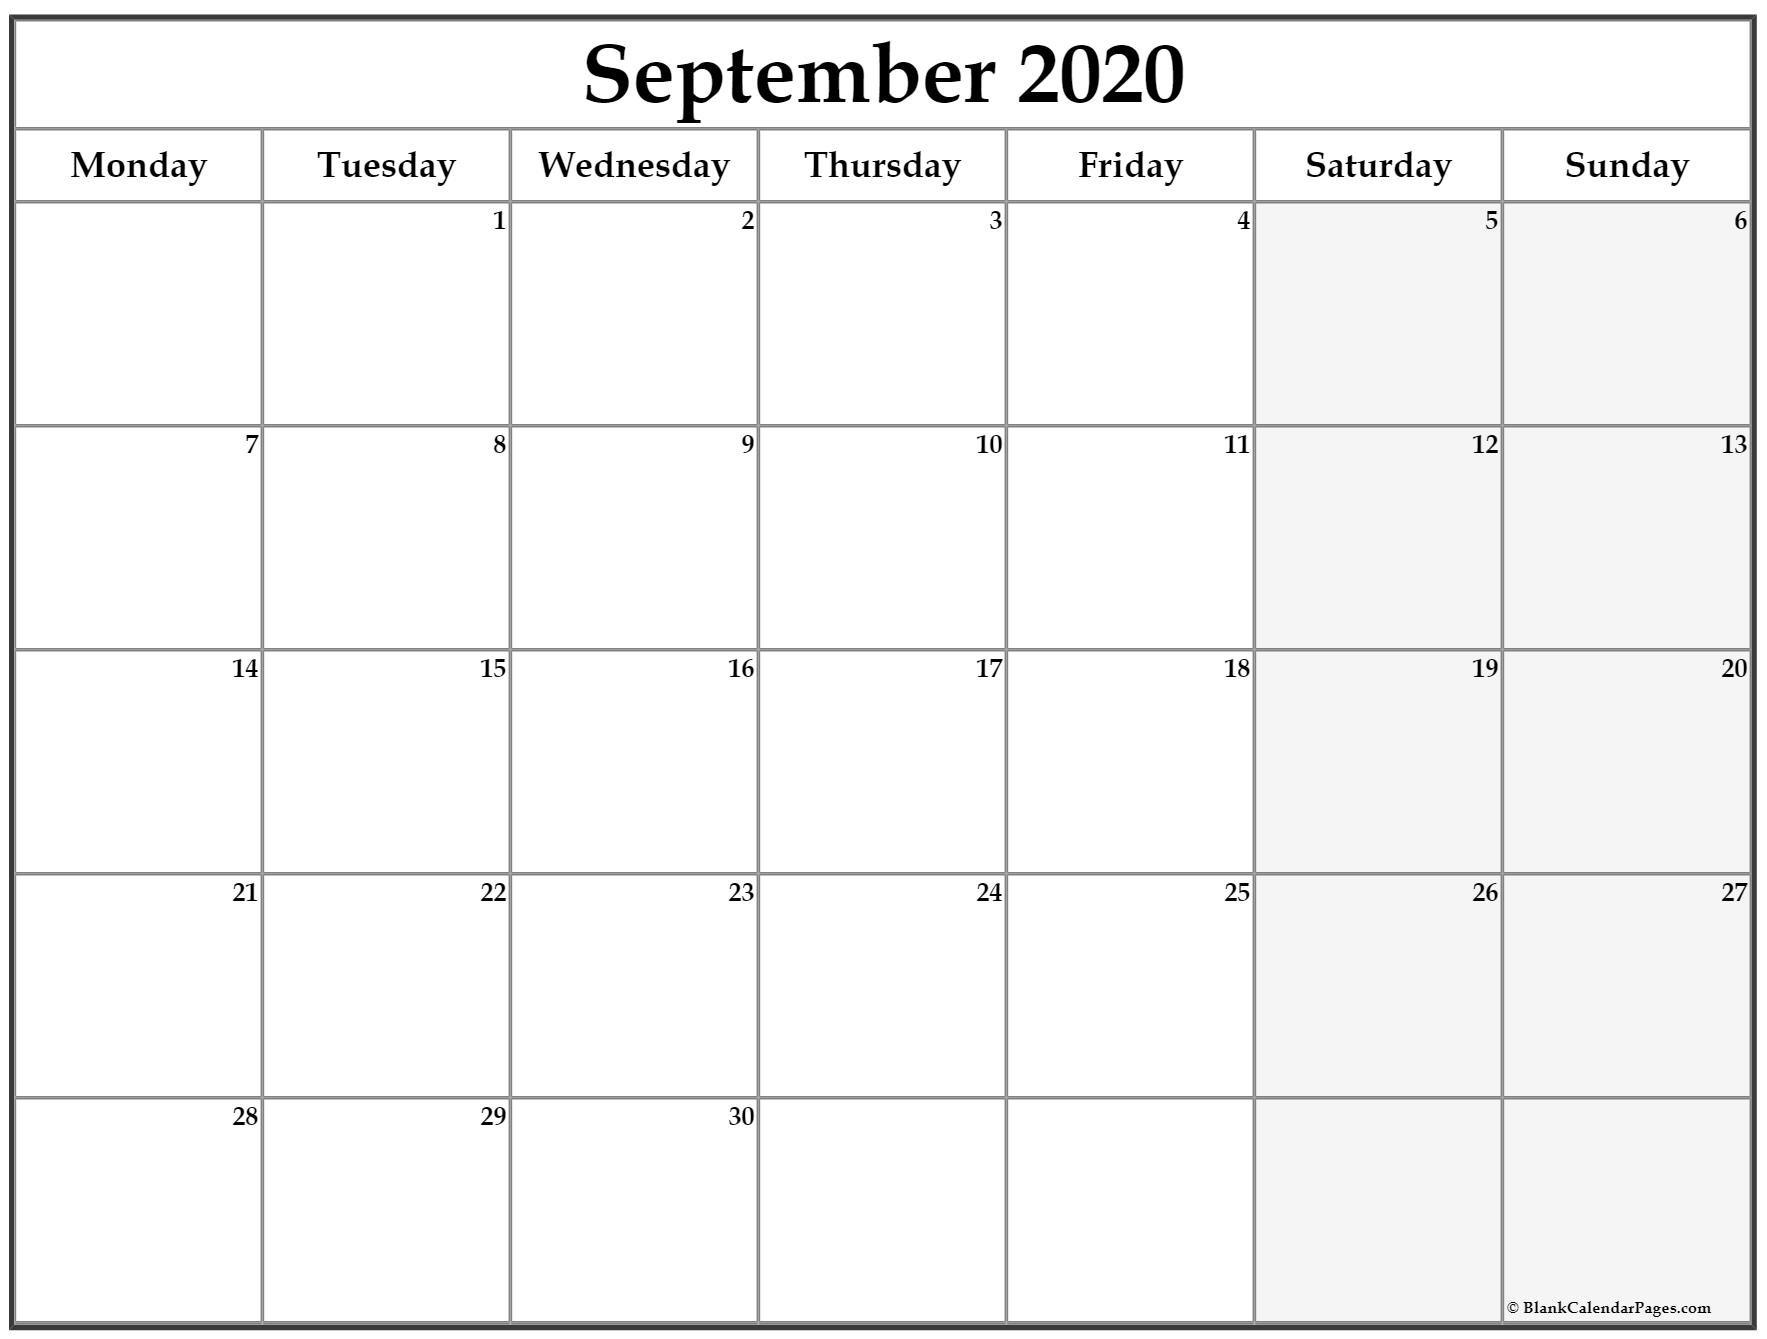 September 2020 Monday Calendar   Monday To Sunday Calendar Saturday To Friday